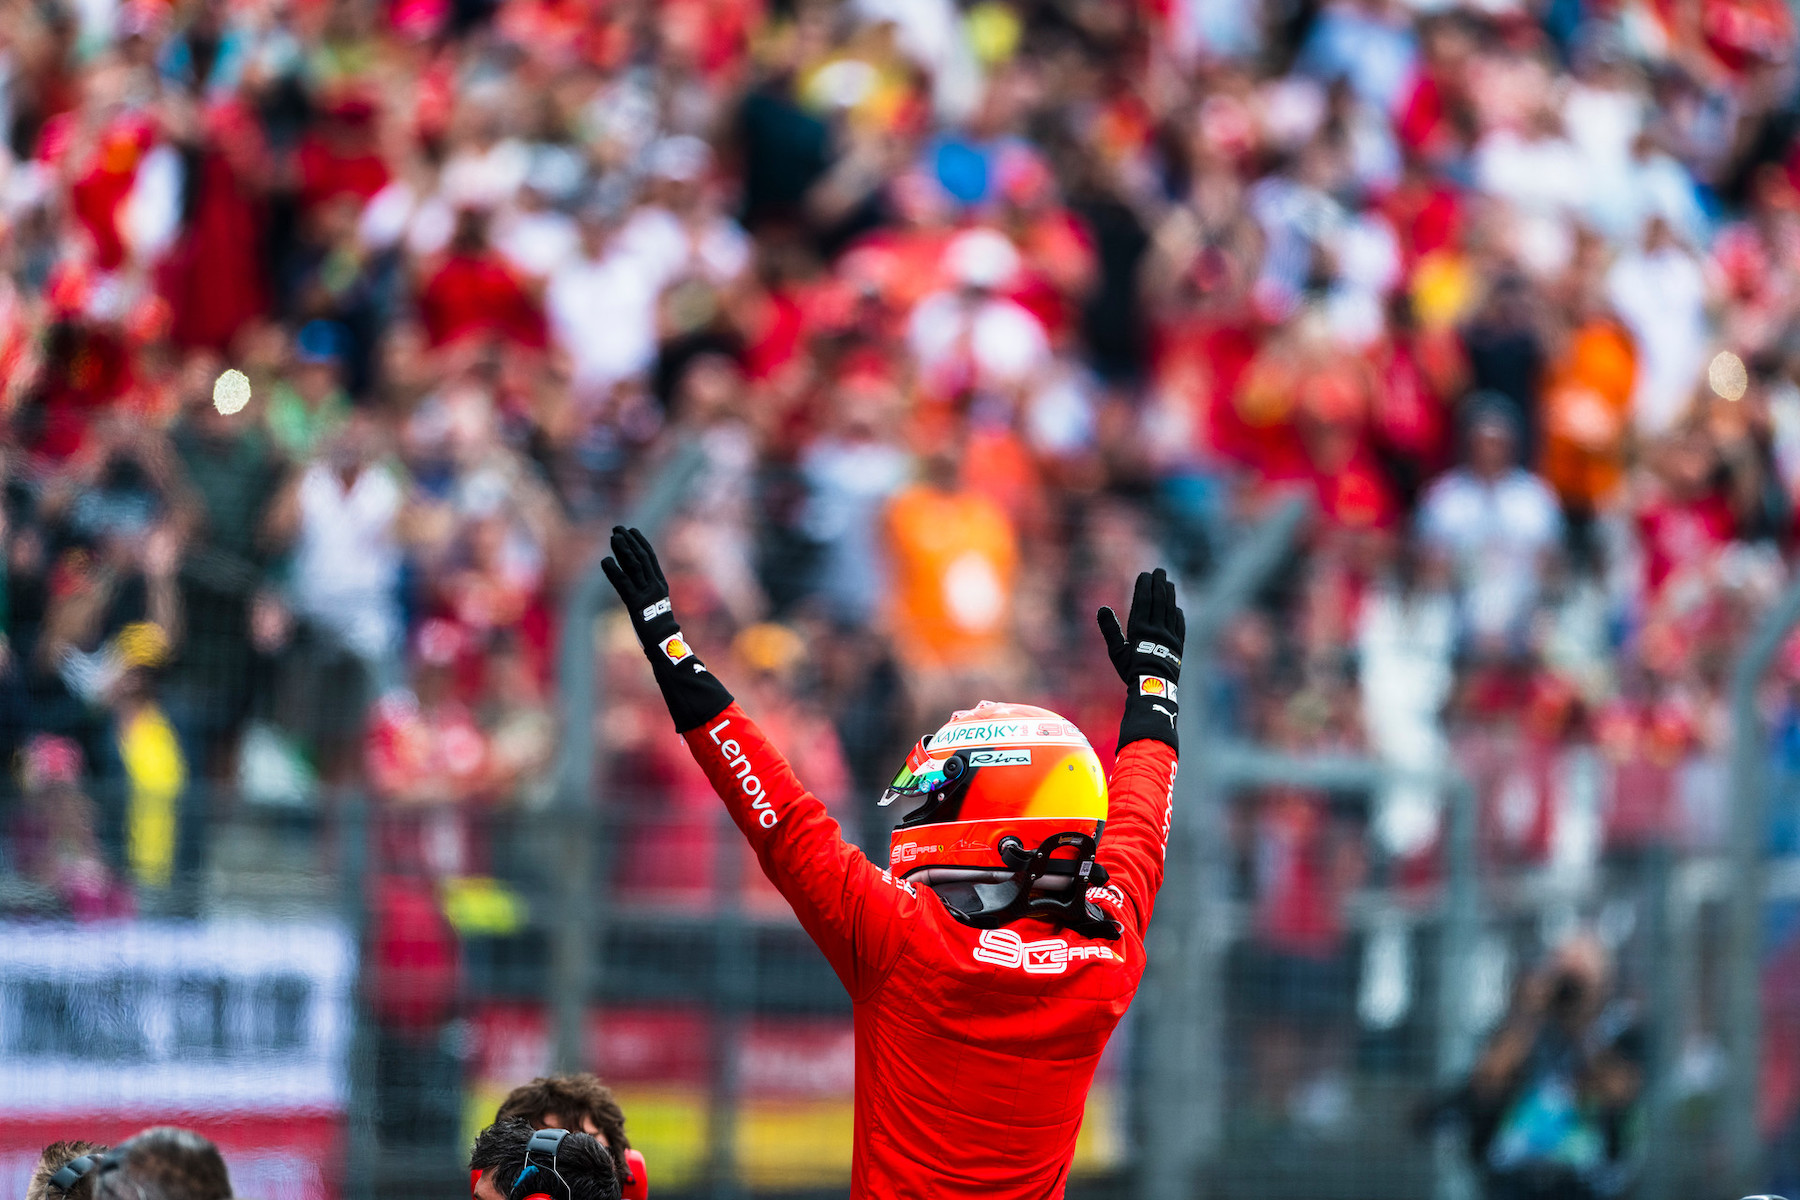 2019 Mick Schumacher | Ferrari F2004 | 2019 German GP 10 copy.jpg